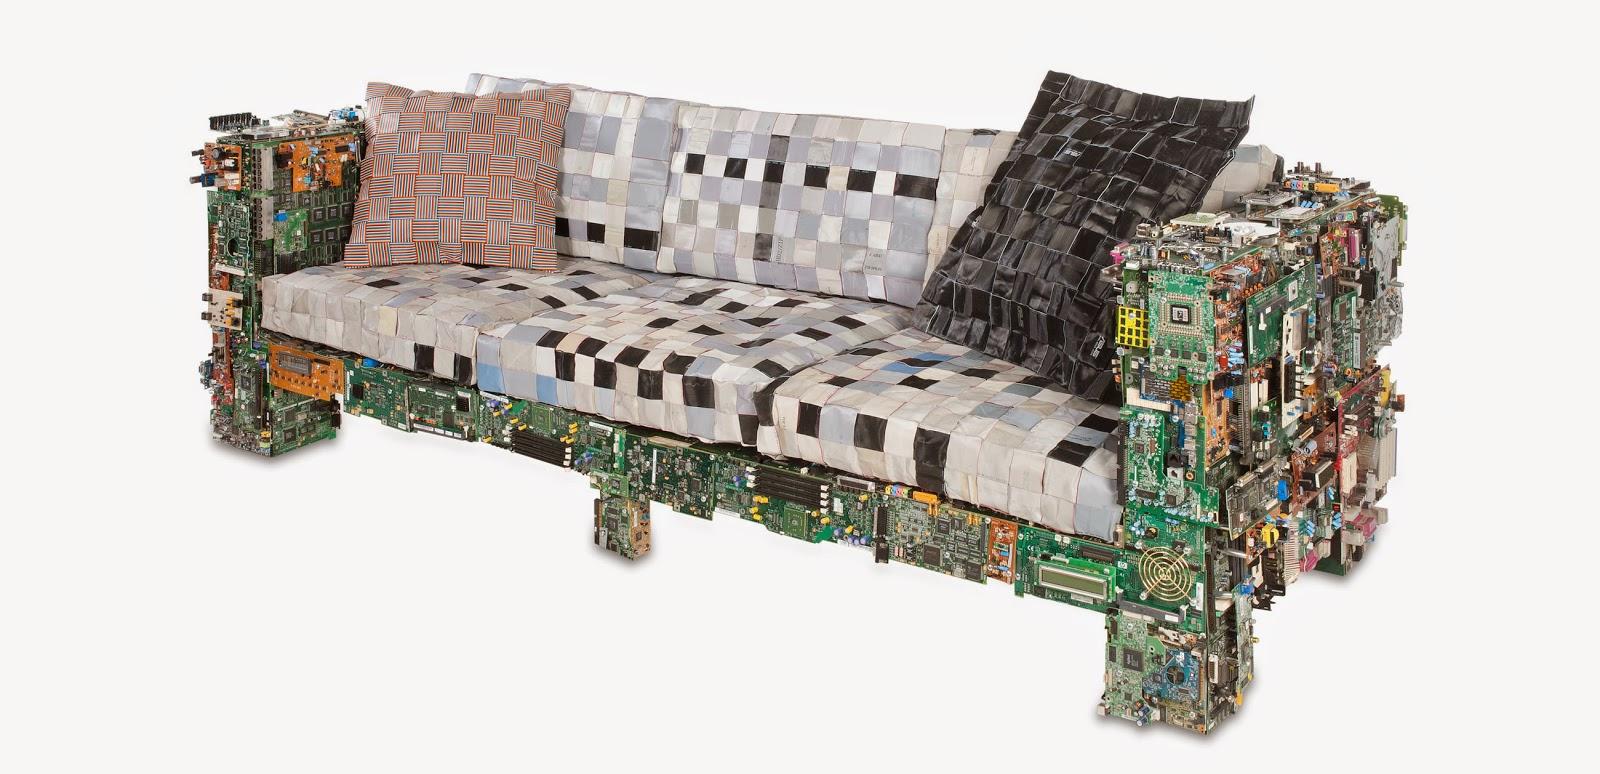 12-Binary-Sofa-Benjamin-Rollins-Caldwell-BRC-Designs-Recycled-Furniture-Sculptor-www-designstack-co